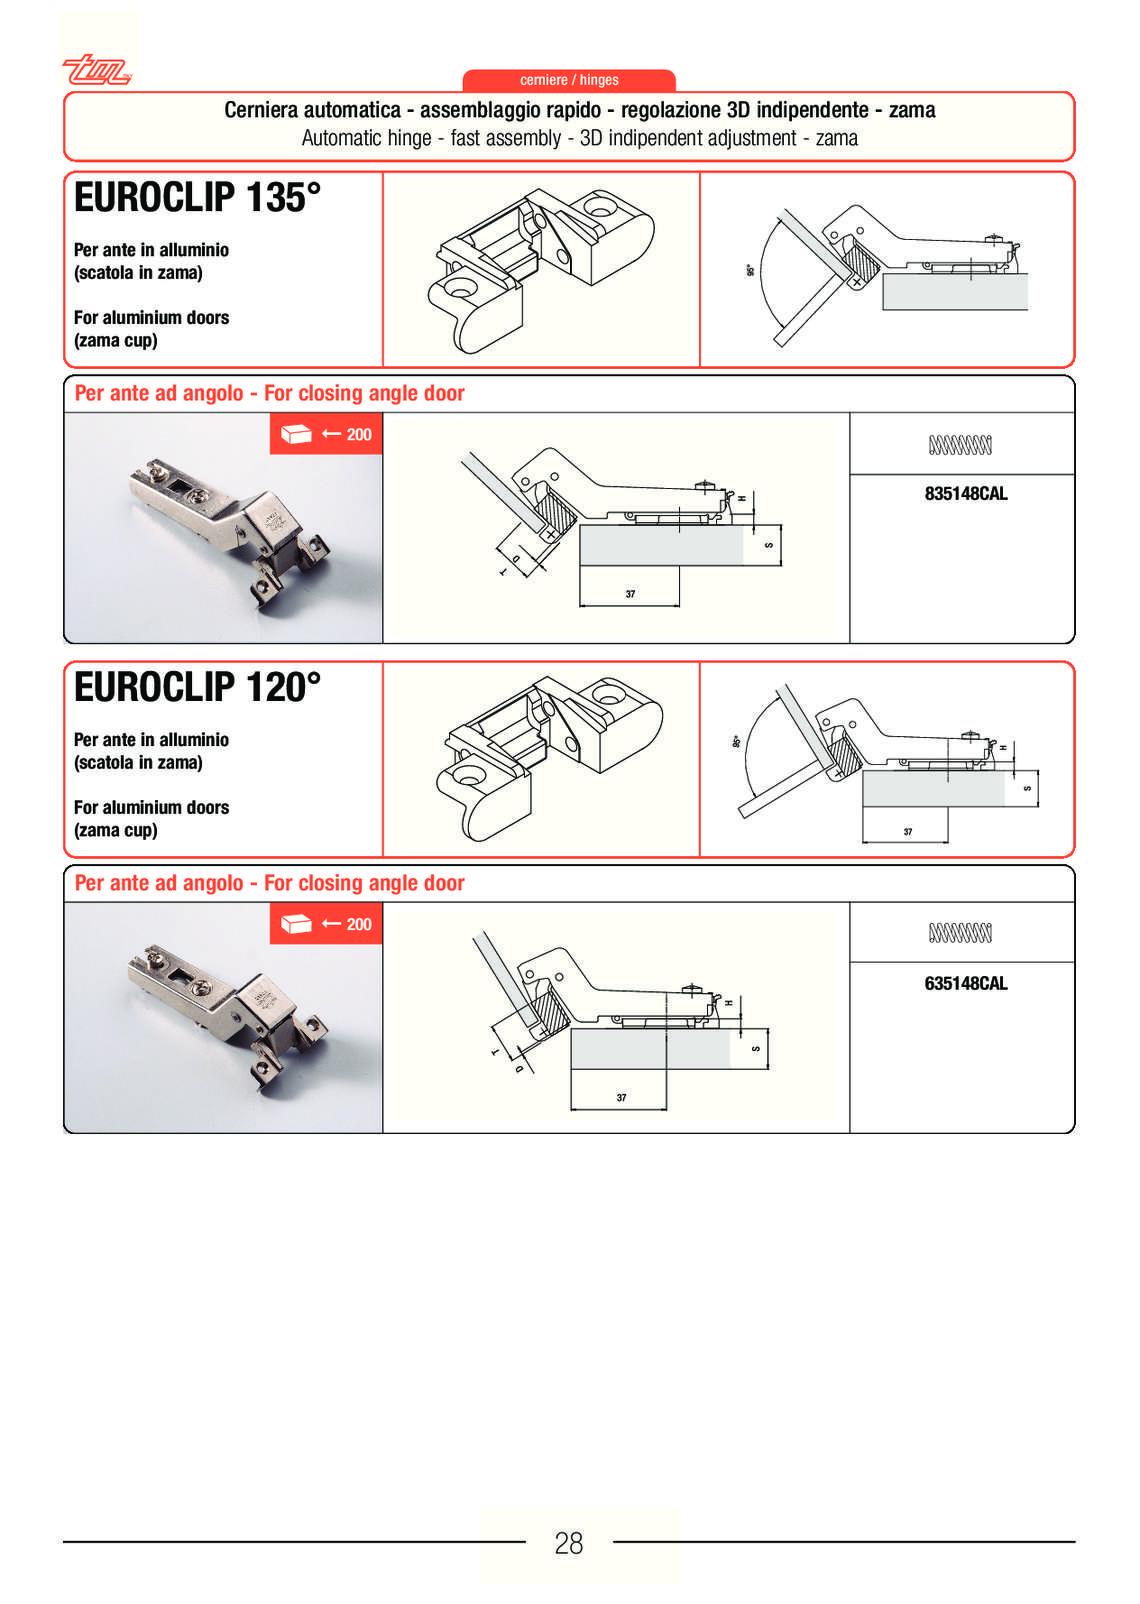 euro-hinges-catalogue_175_027.jpg